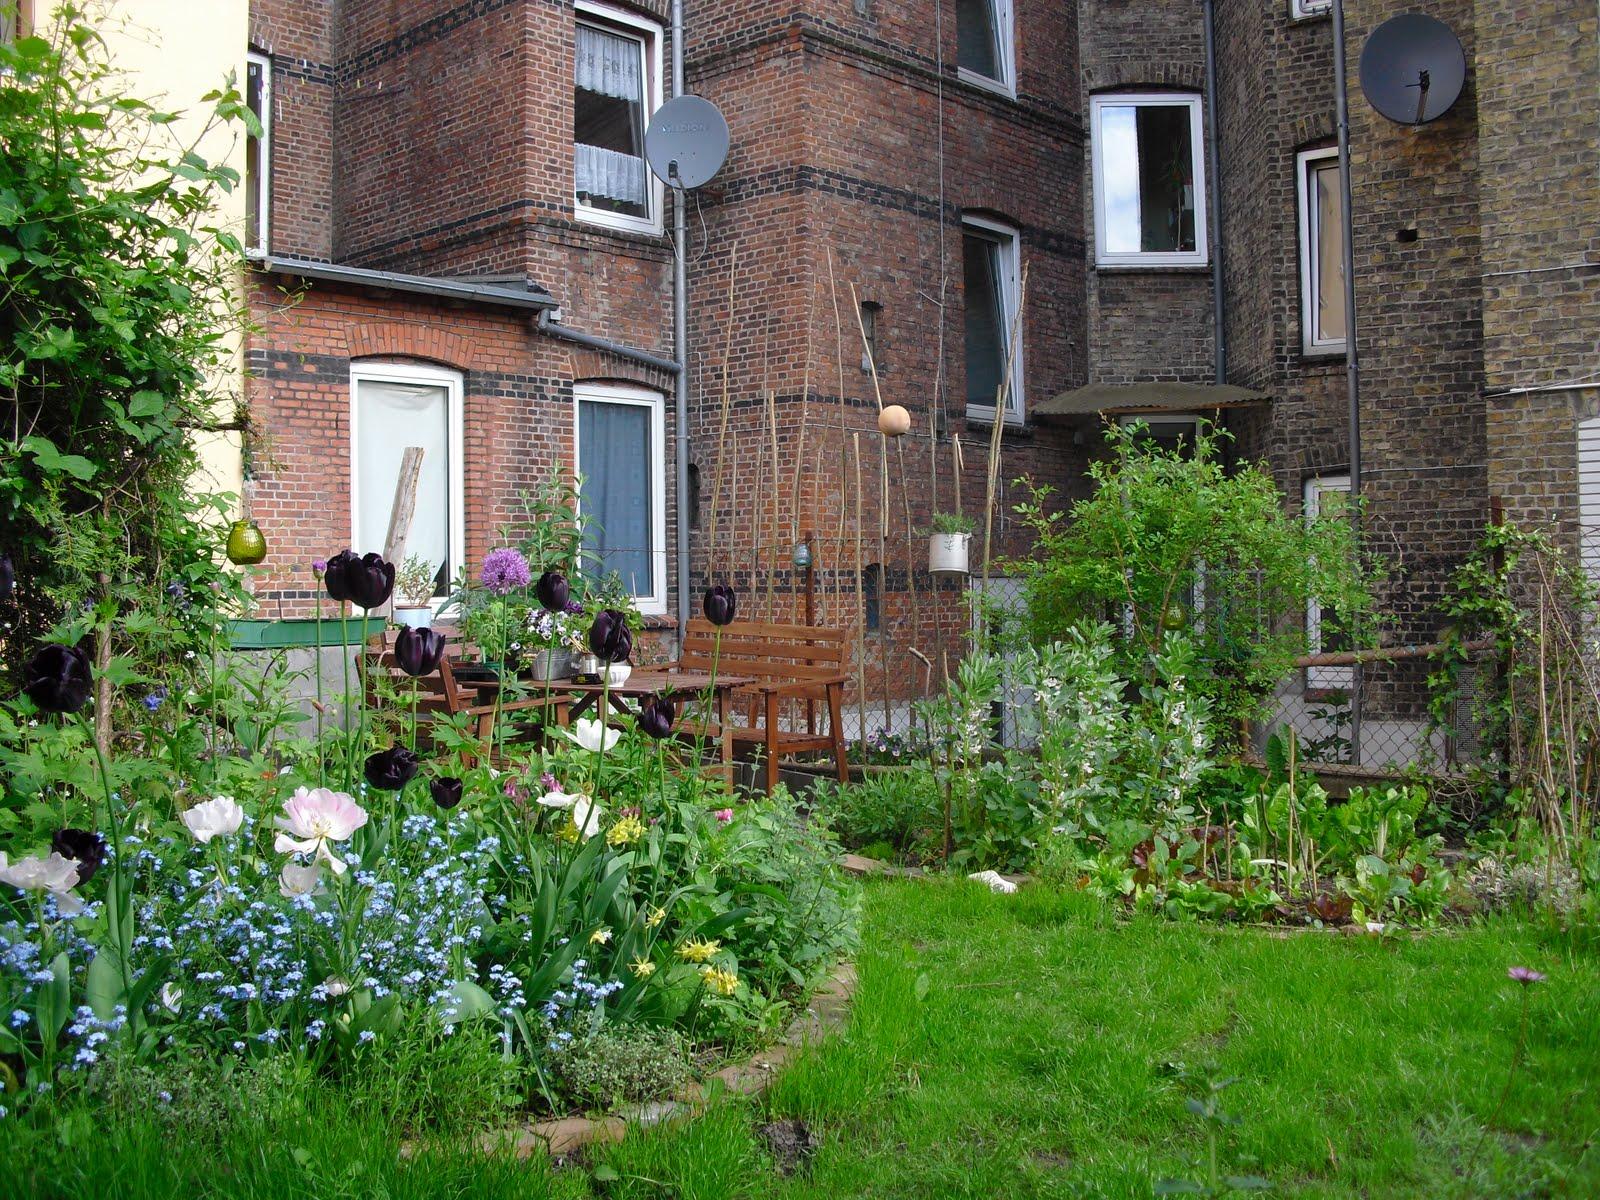 mauerblumen ber gem seanbau in meinem hinterhof. Black Bedroom Furniture Sets. Home Design Ideas